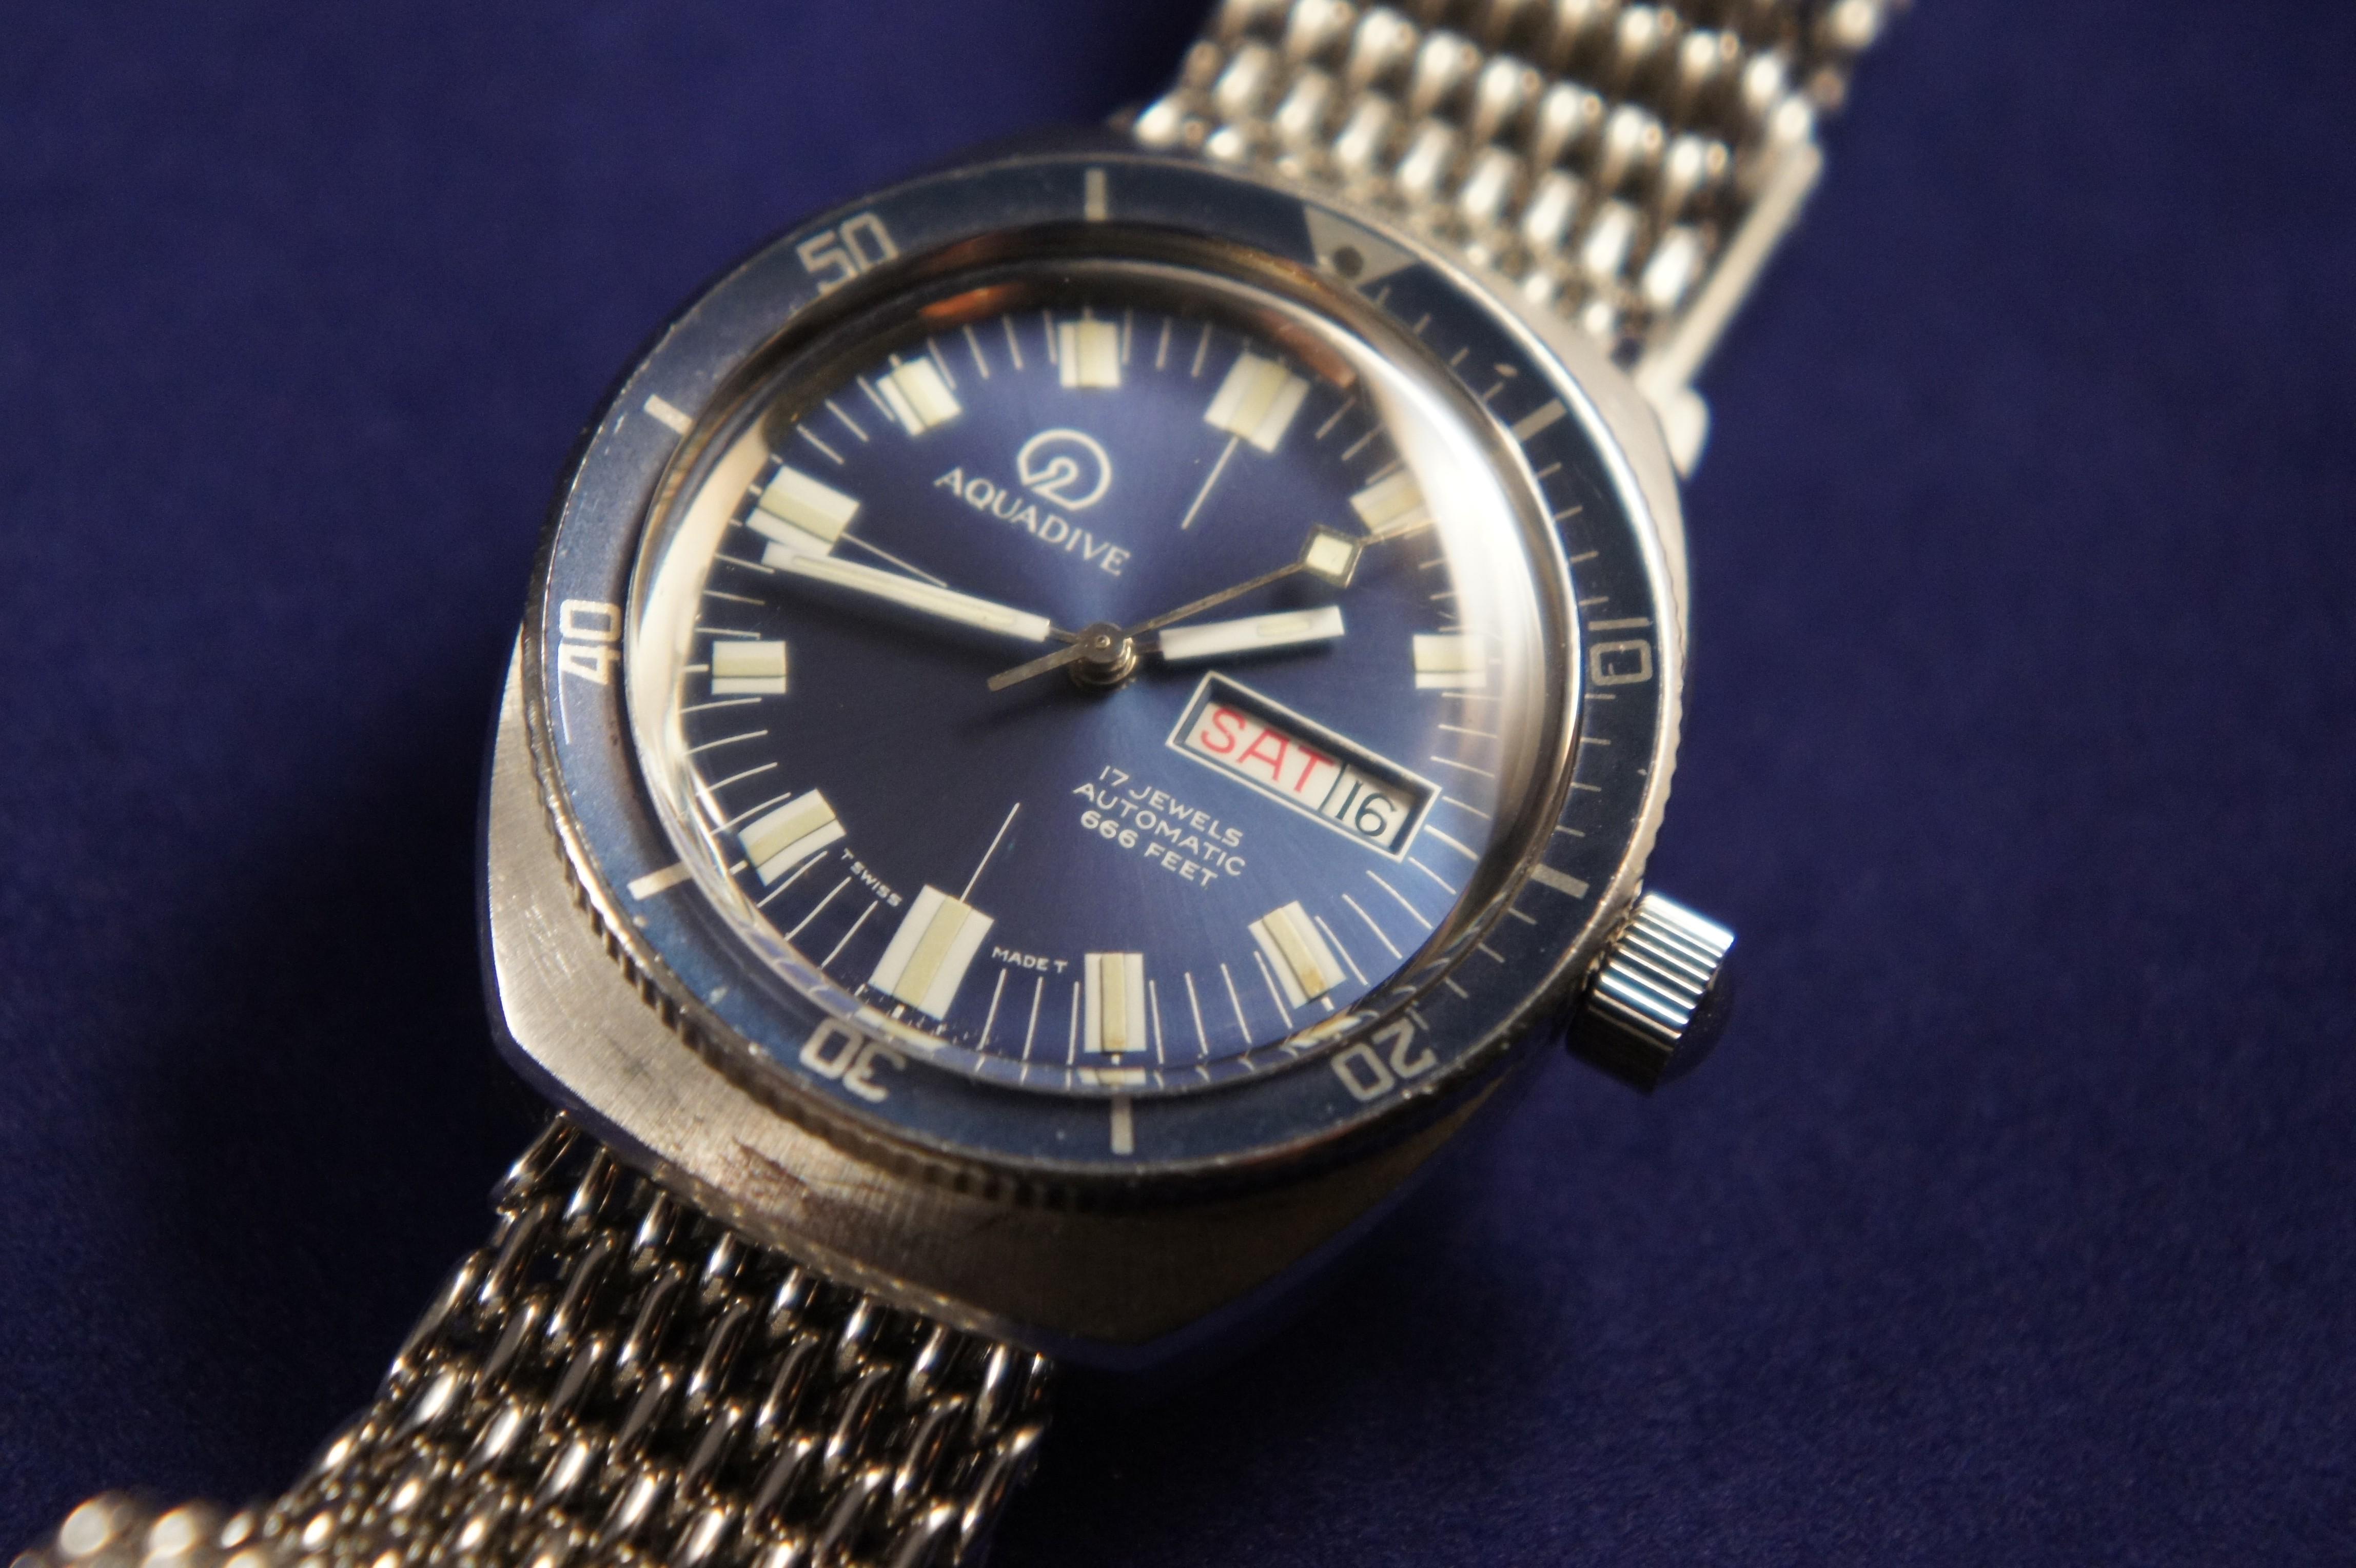 Sold '70s Vintage Aquadive 200m Blue Diver. Horizontal Cross Bracelet. Diamond Cut Bangles. Cubic Zirconia Rings. Lapis Lazuli Pendant. Peacock Pearls. Cocktail Ring Diamond. Brain Cancer Bracelet. Charm Pendant